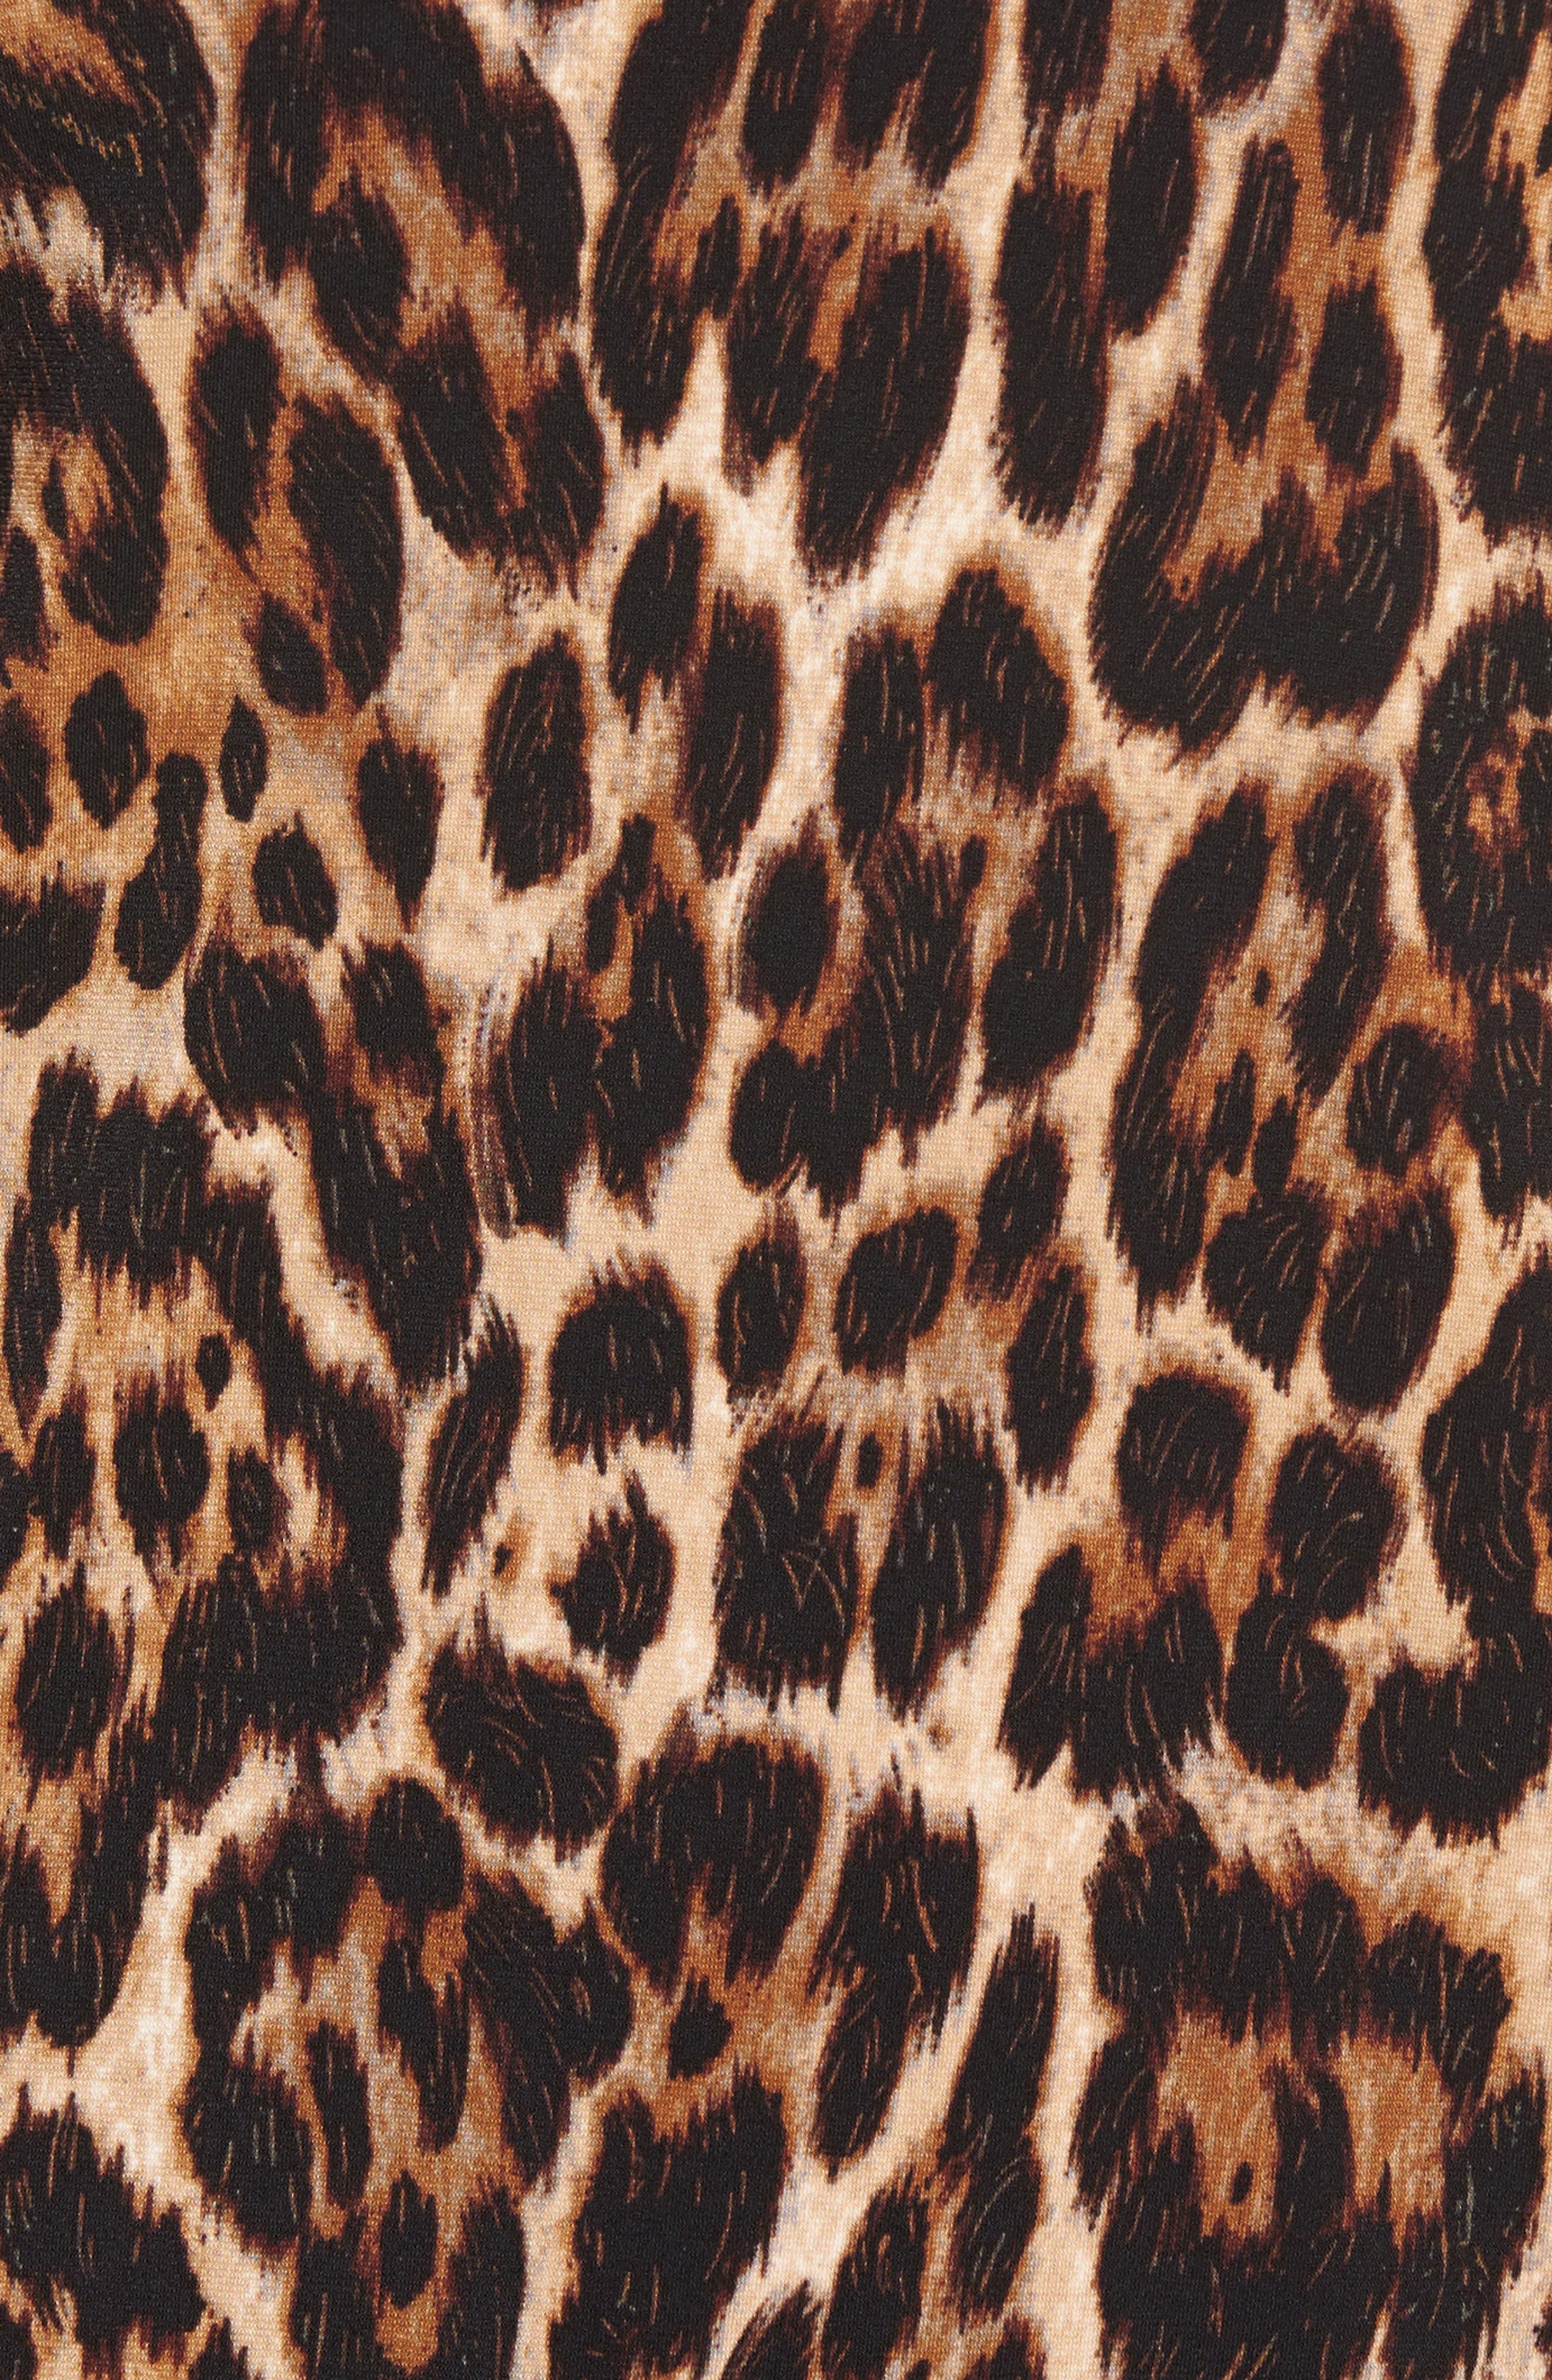 Leopard Print Pleat V-Neck Top,                             Alternate thumbnail 5, color,                             Baton Combo